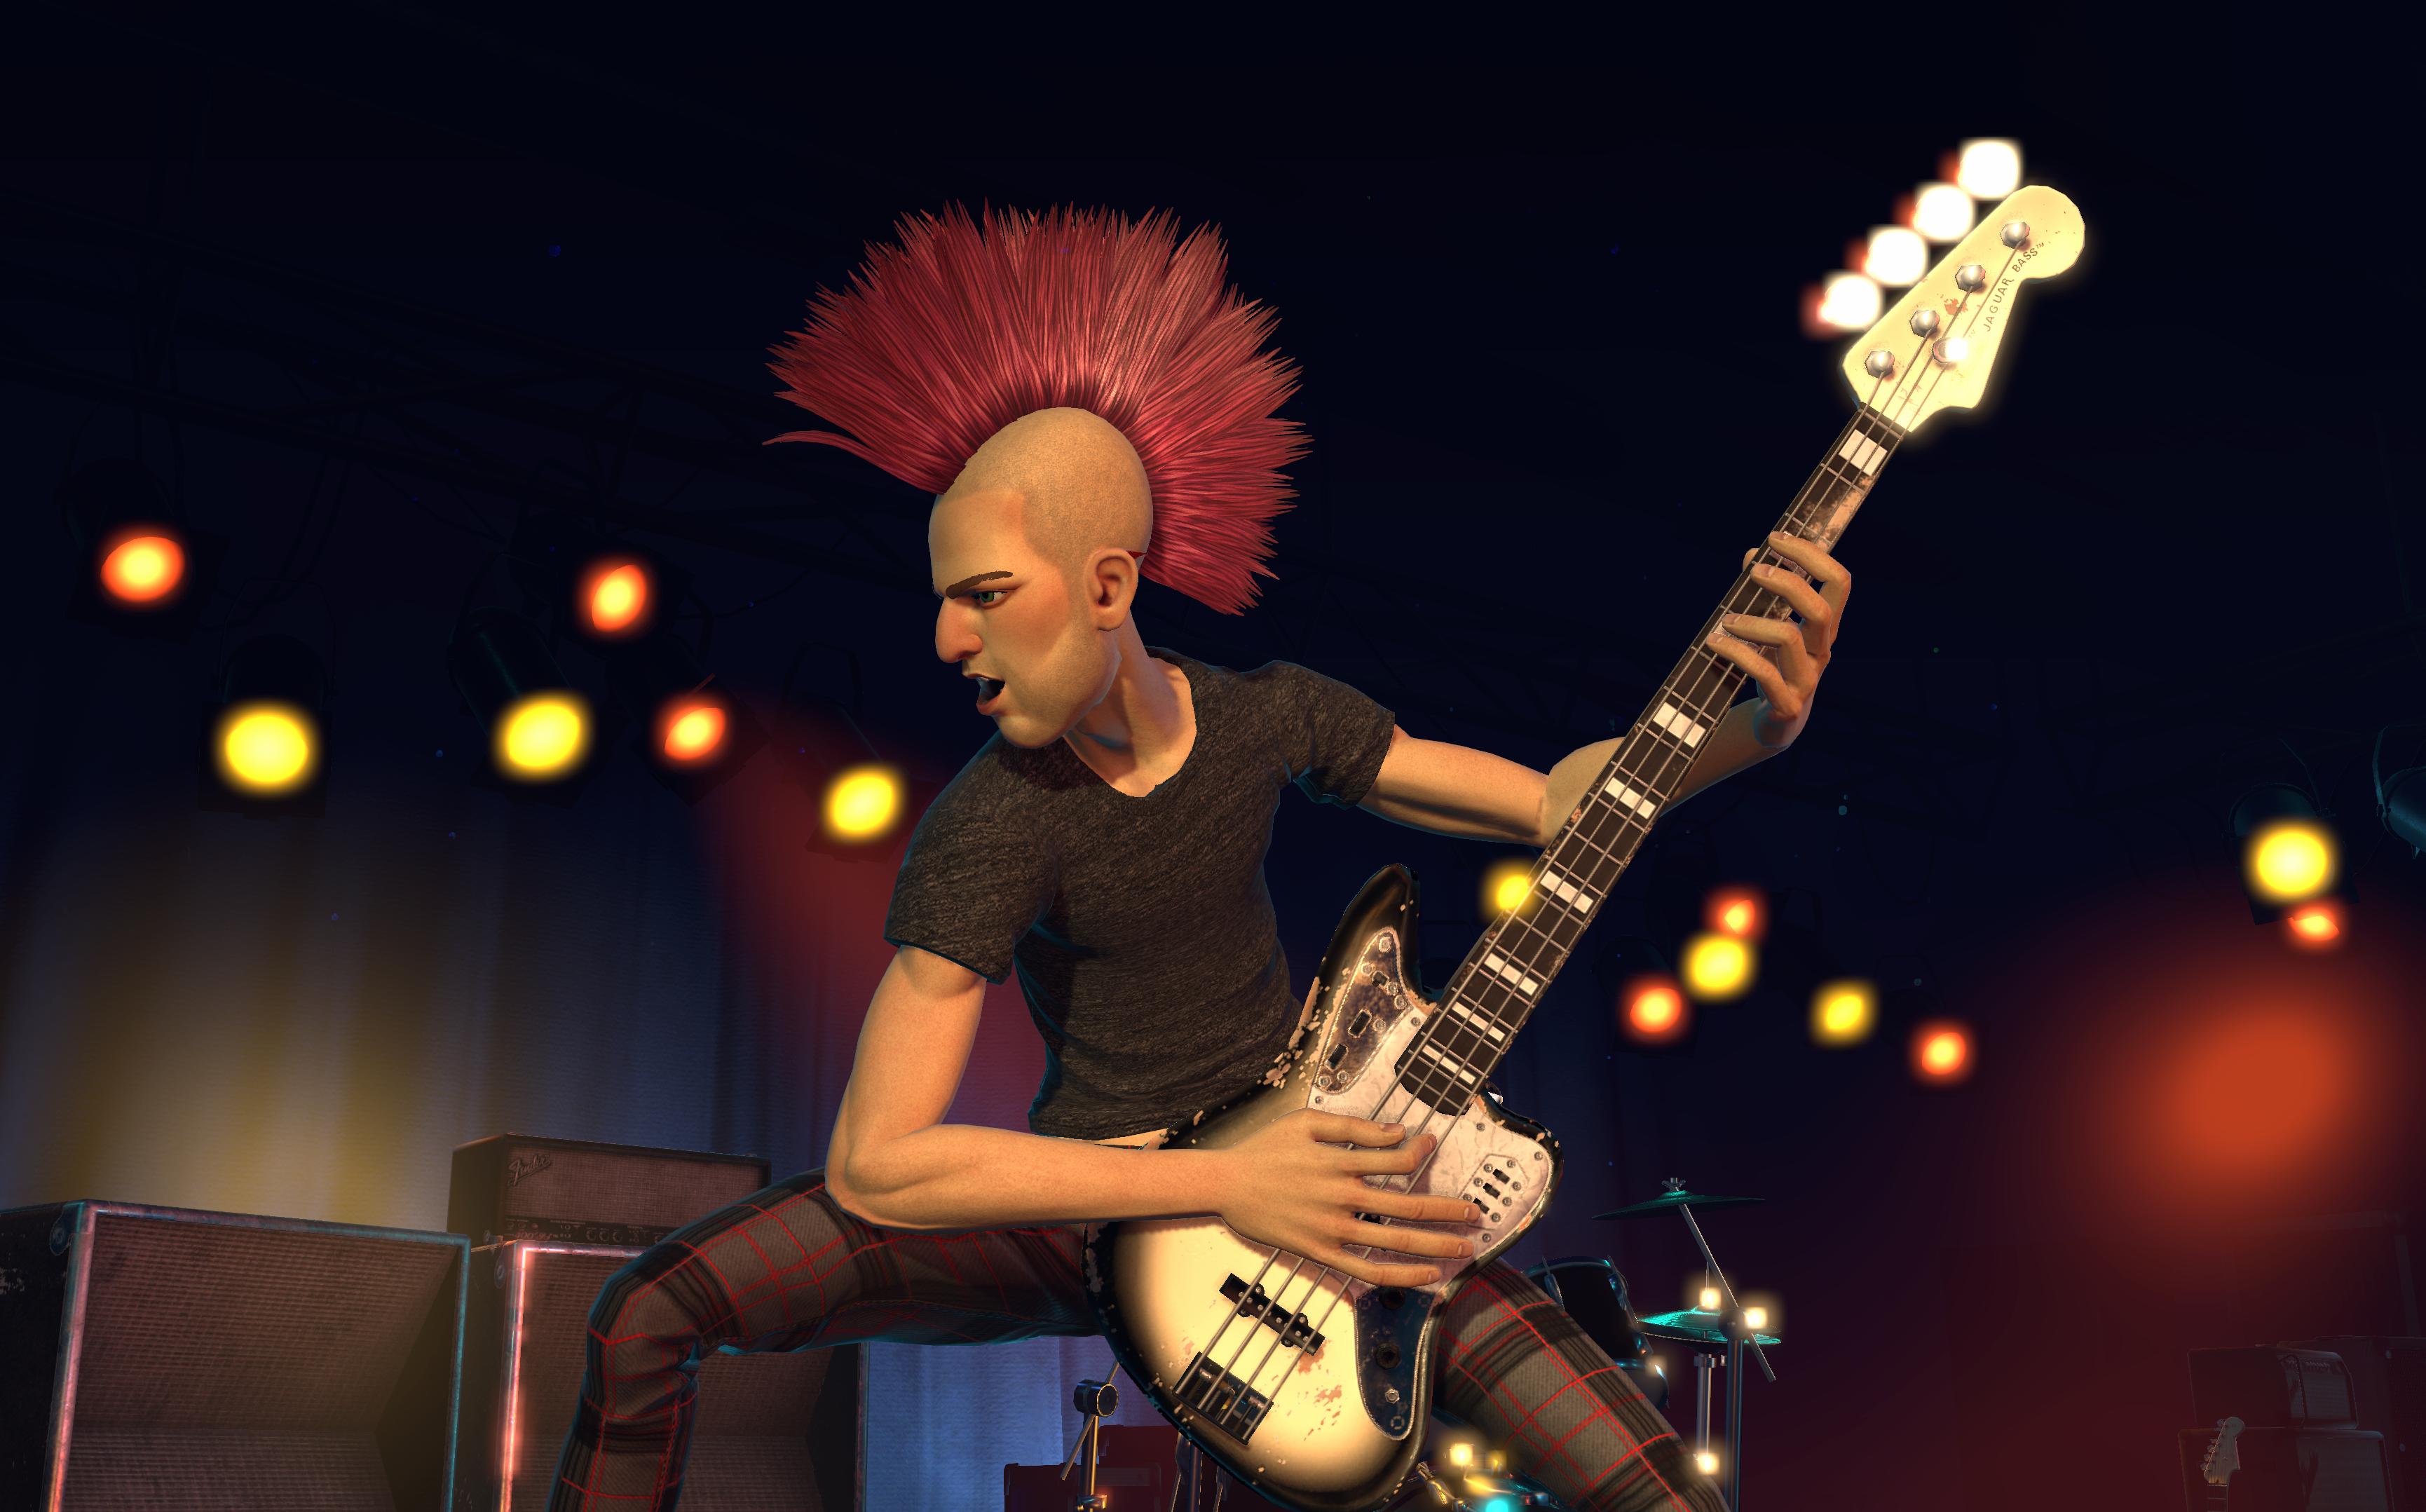 Fender Guitar in Rock Band 4